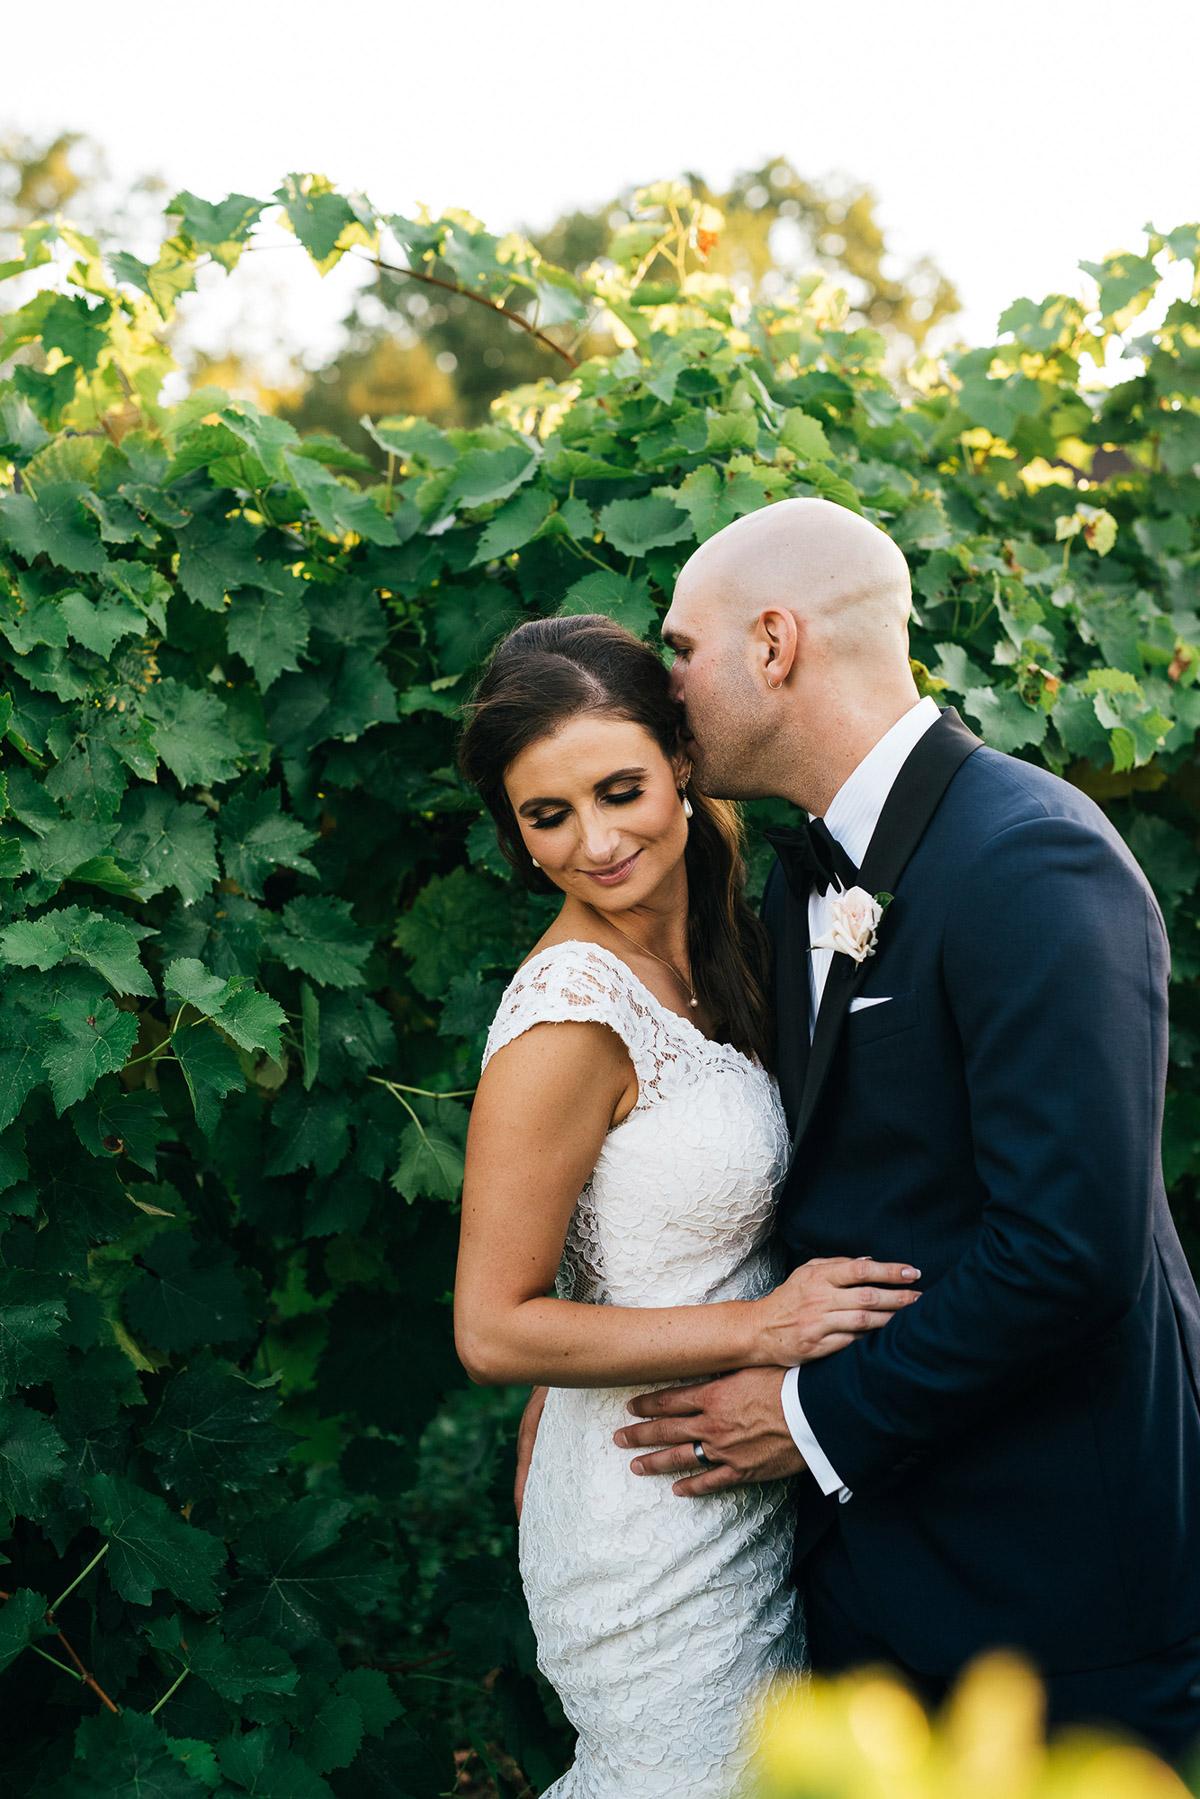 shaw-events-vineyard-bride-swish-list-kurtz-orchards-niagara-on-the-lake-wedding-10.jpg